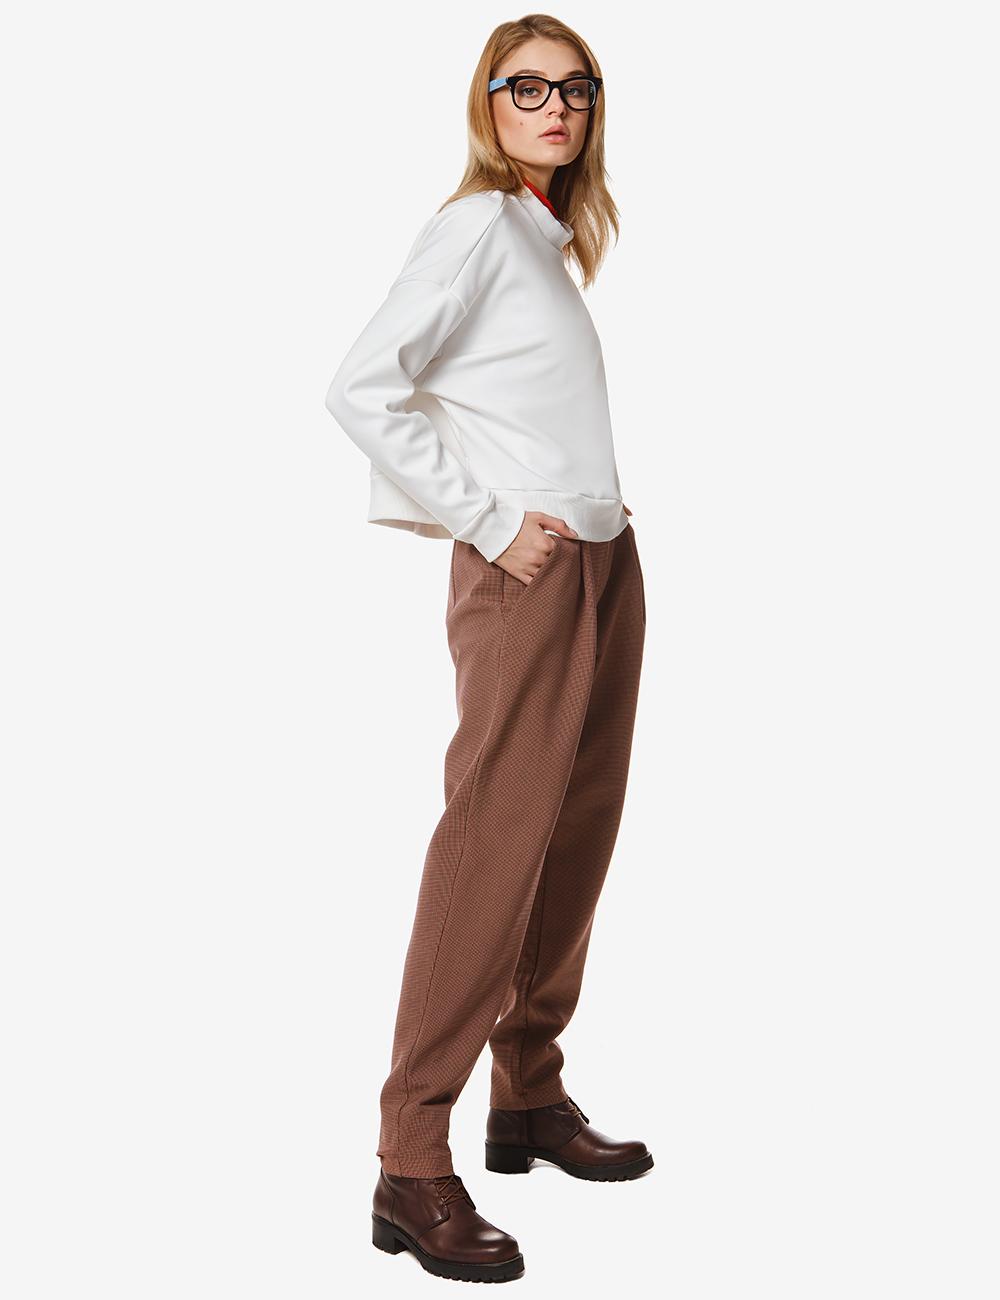 Свитшот женский UNU Clothing Prime 228 AJ-Н белый M